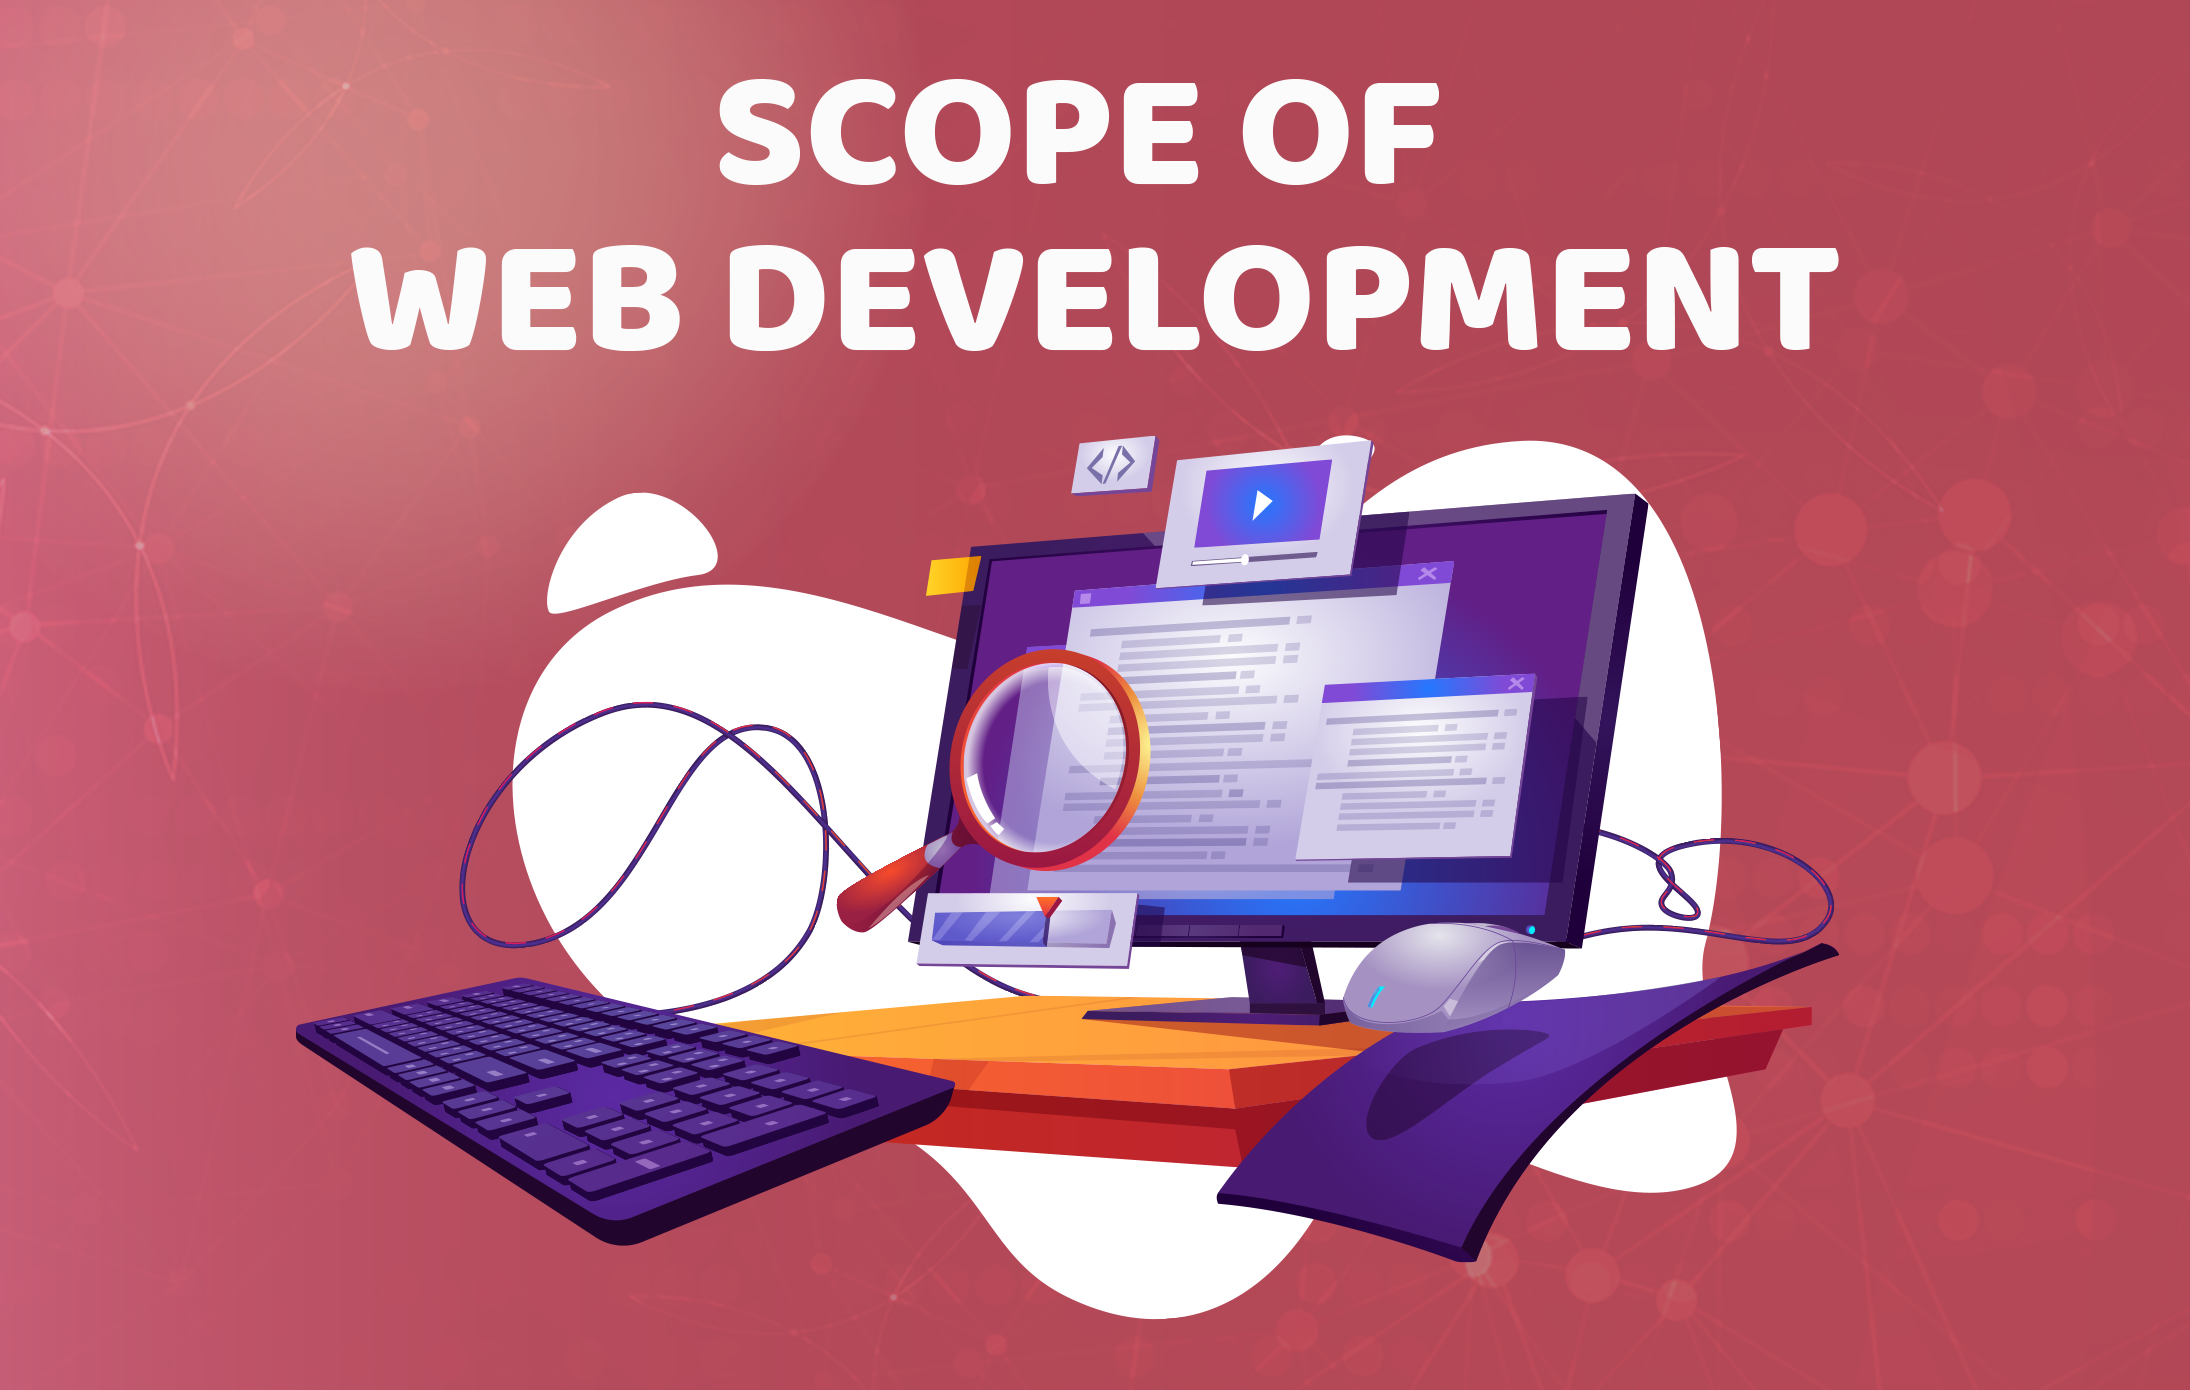 Scope of web development